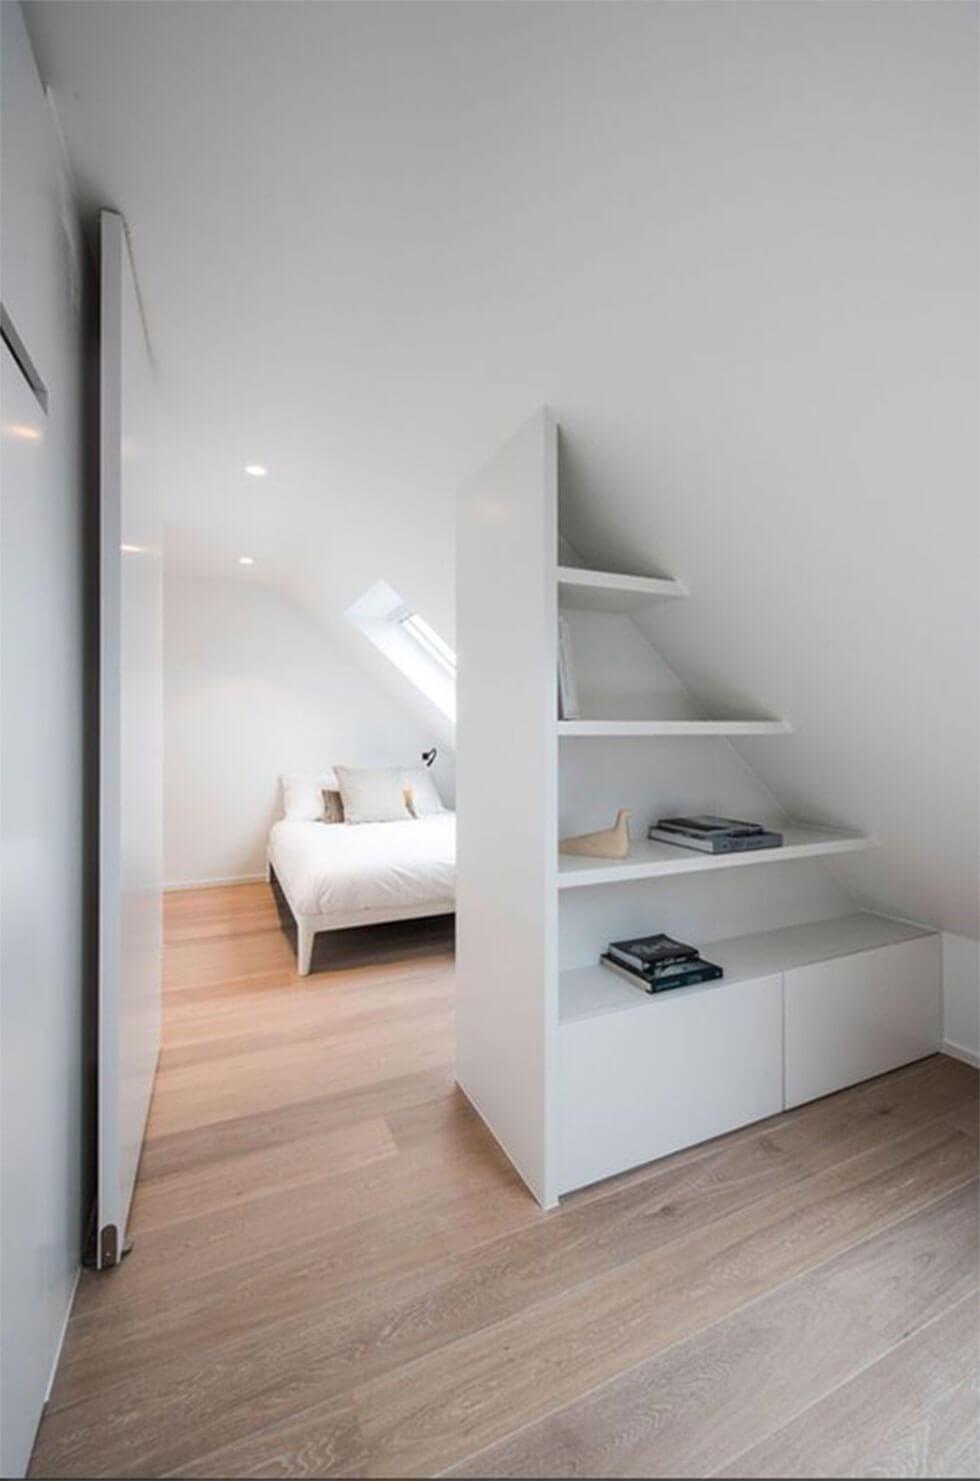 10 stylish loft bedroom ideas